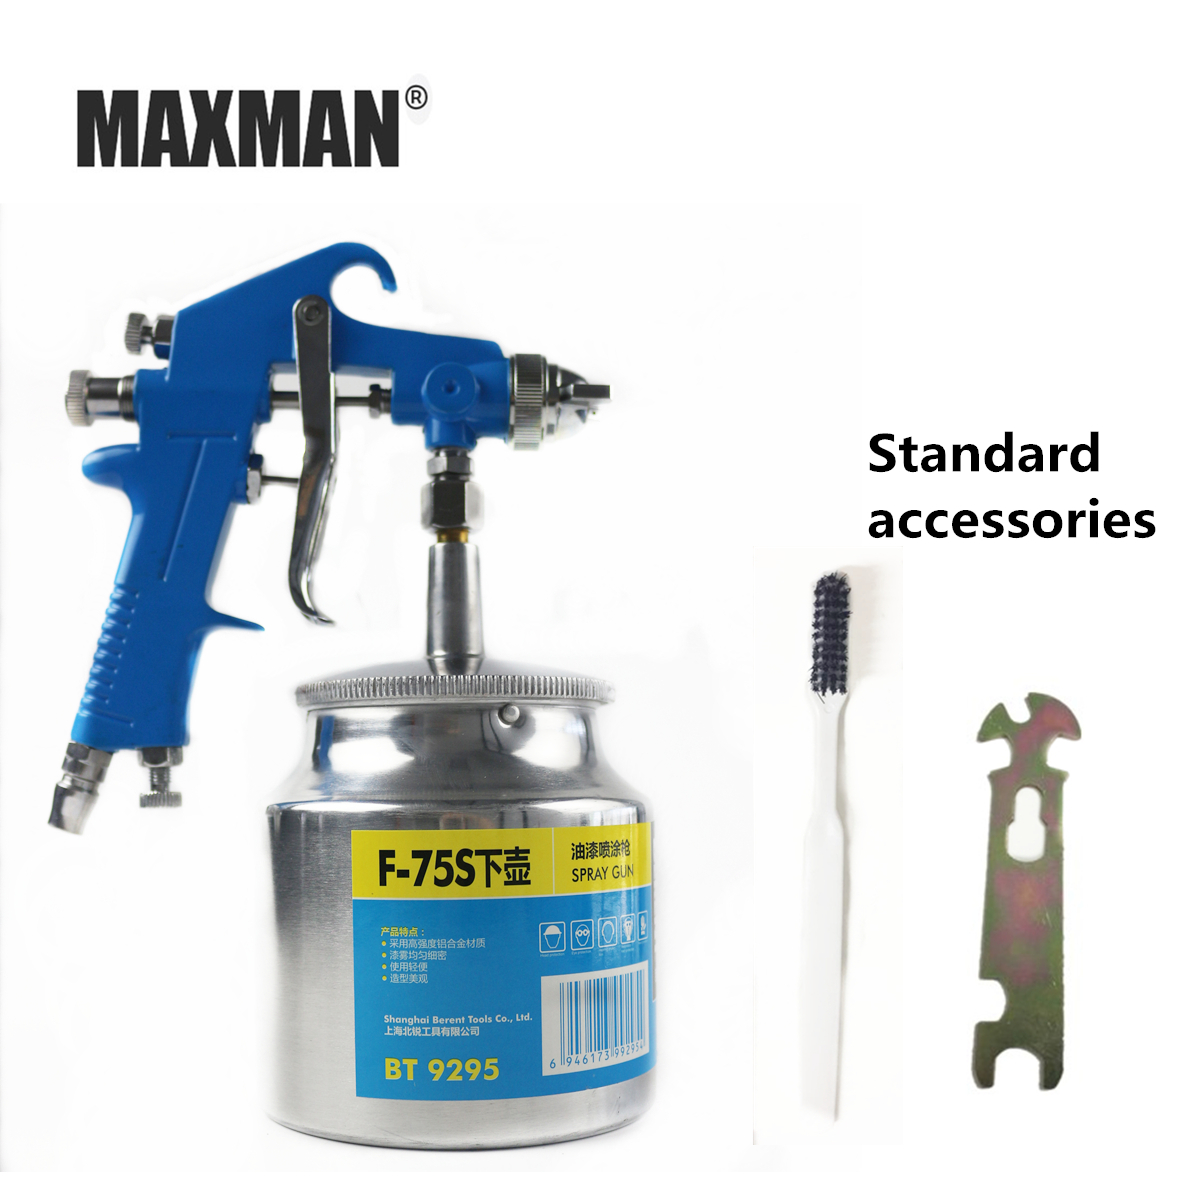 цена на MAXMAN F-75S Type Paint Spray Gun Automatic Spray Gun High Strength Aluminum Alloy Home Spray Paint Spray Gun Tool